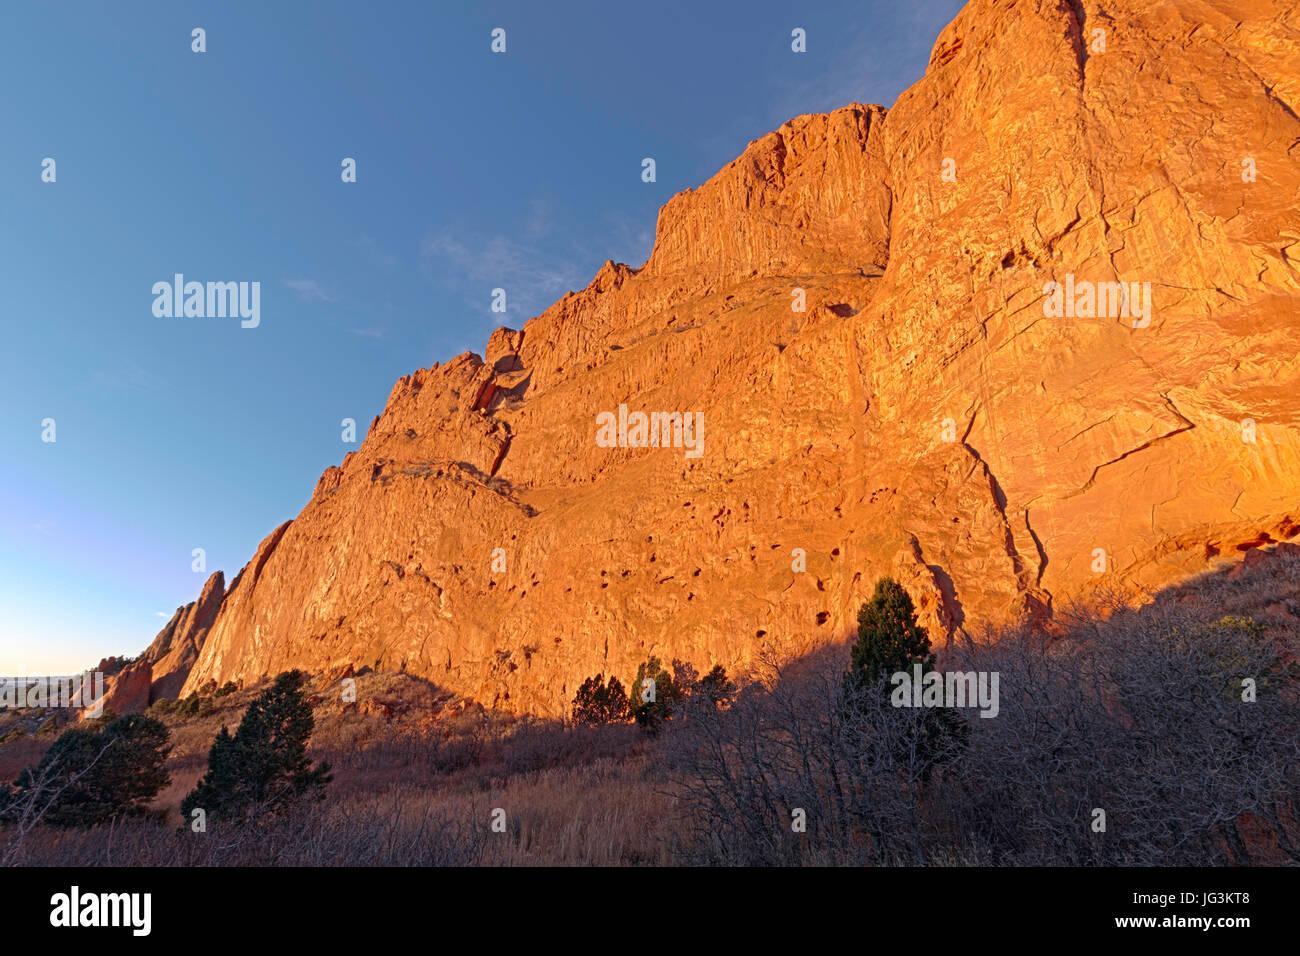 North Gateway Rock seen in the morning sun at Garden of the Gods, Colorado Springs, Colorado. - Stock Image